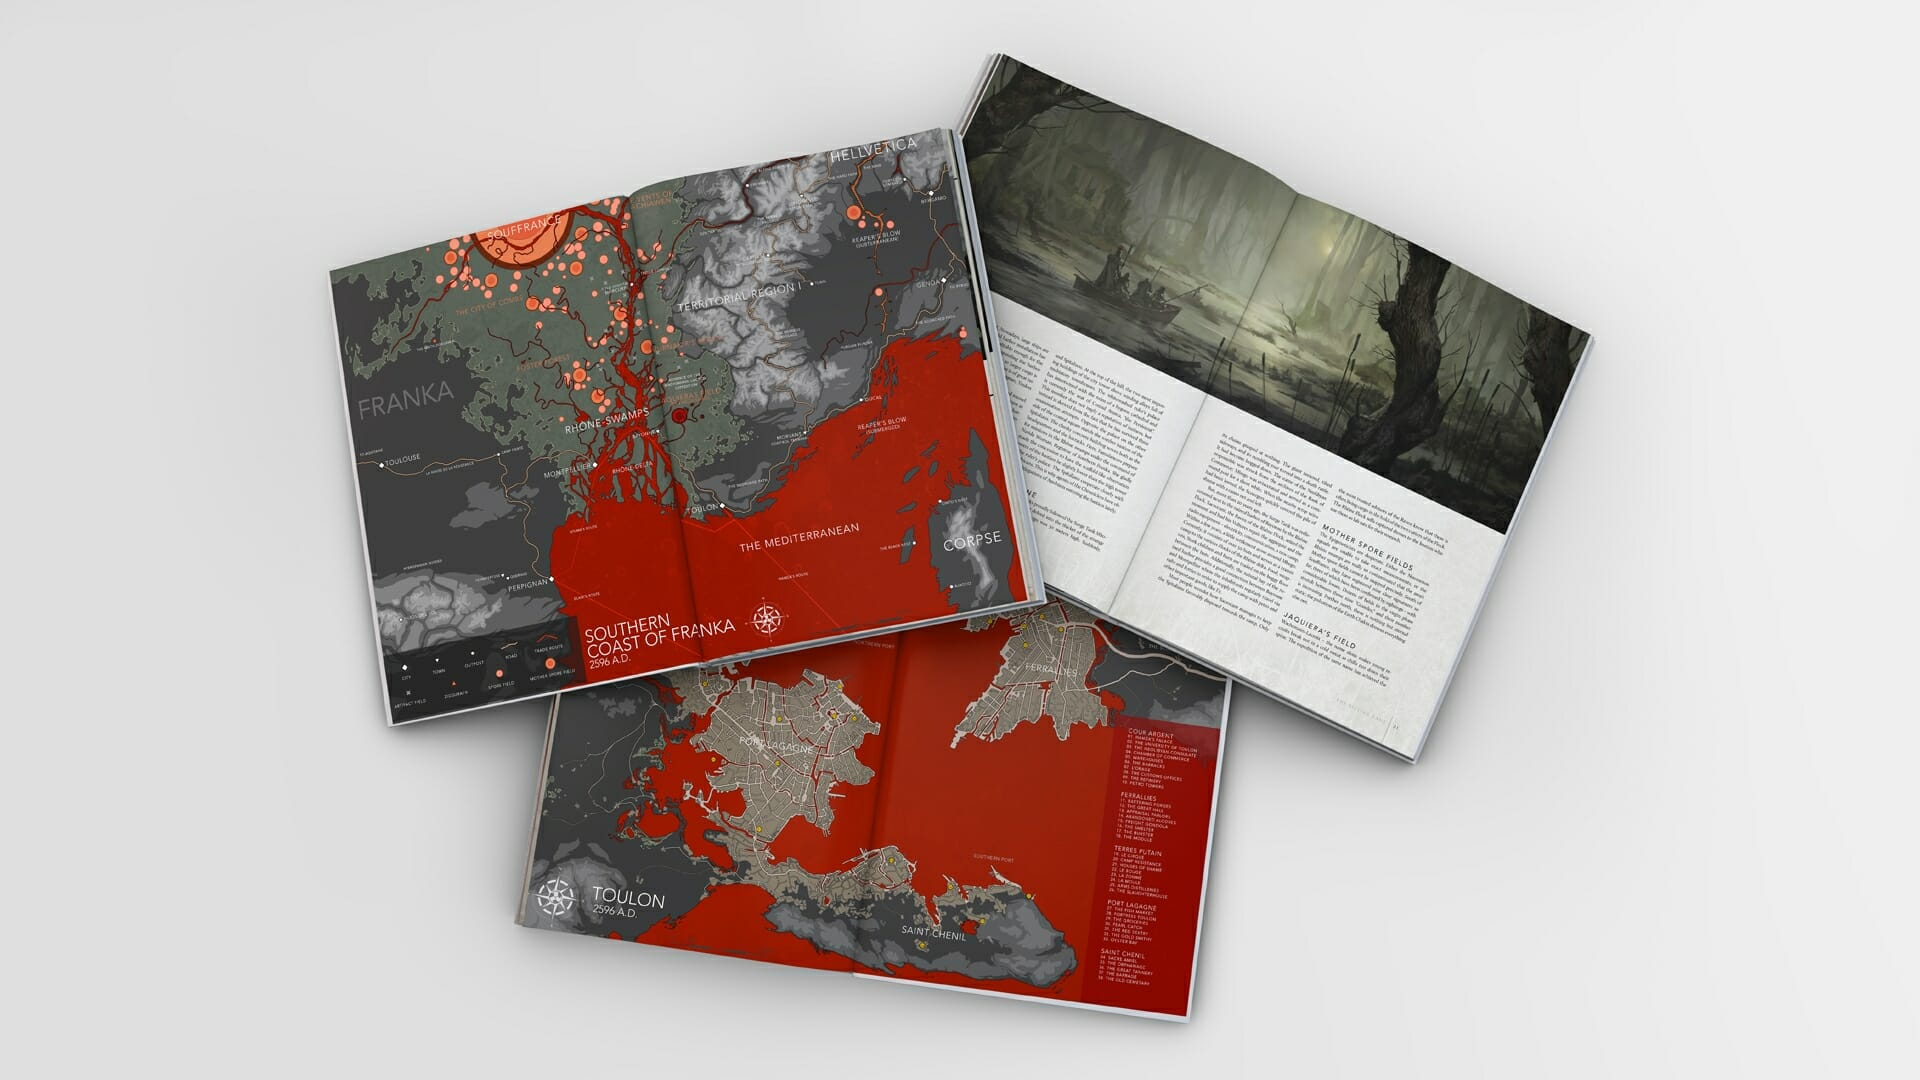 A look inside: Degenesis - The Killing Game